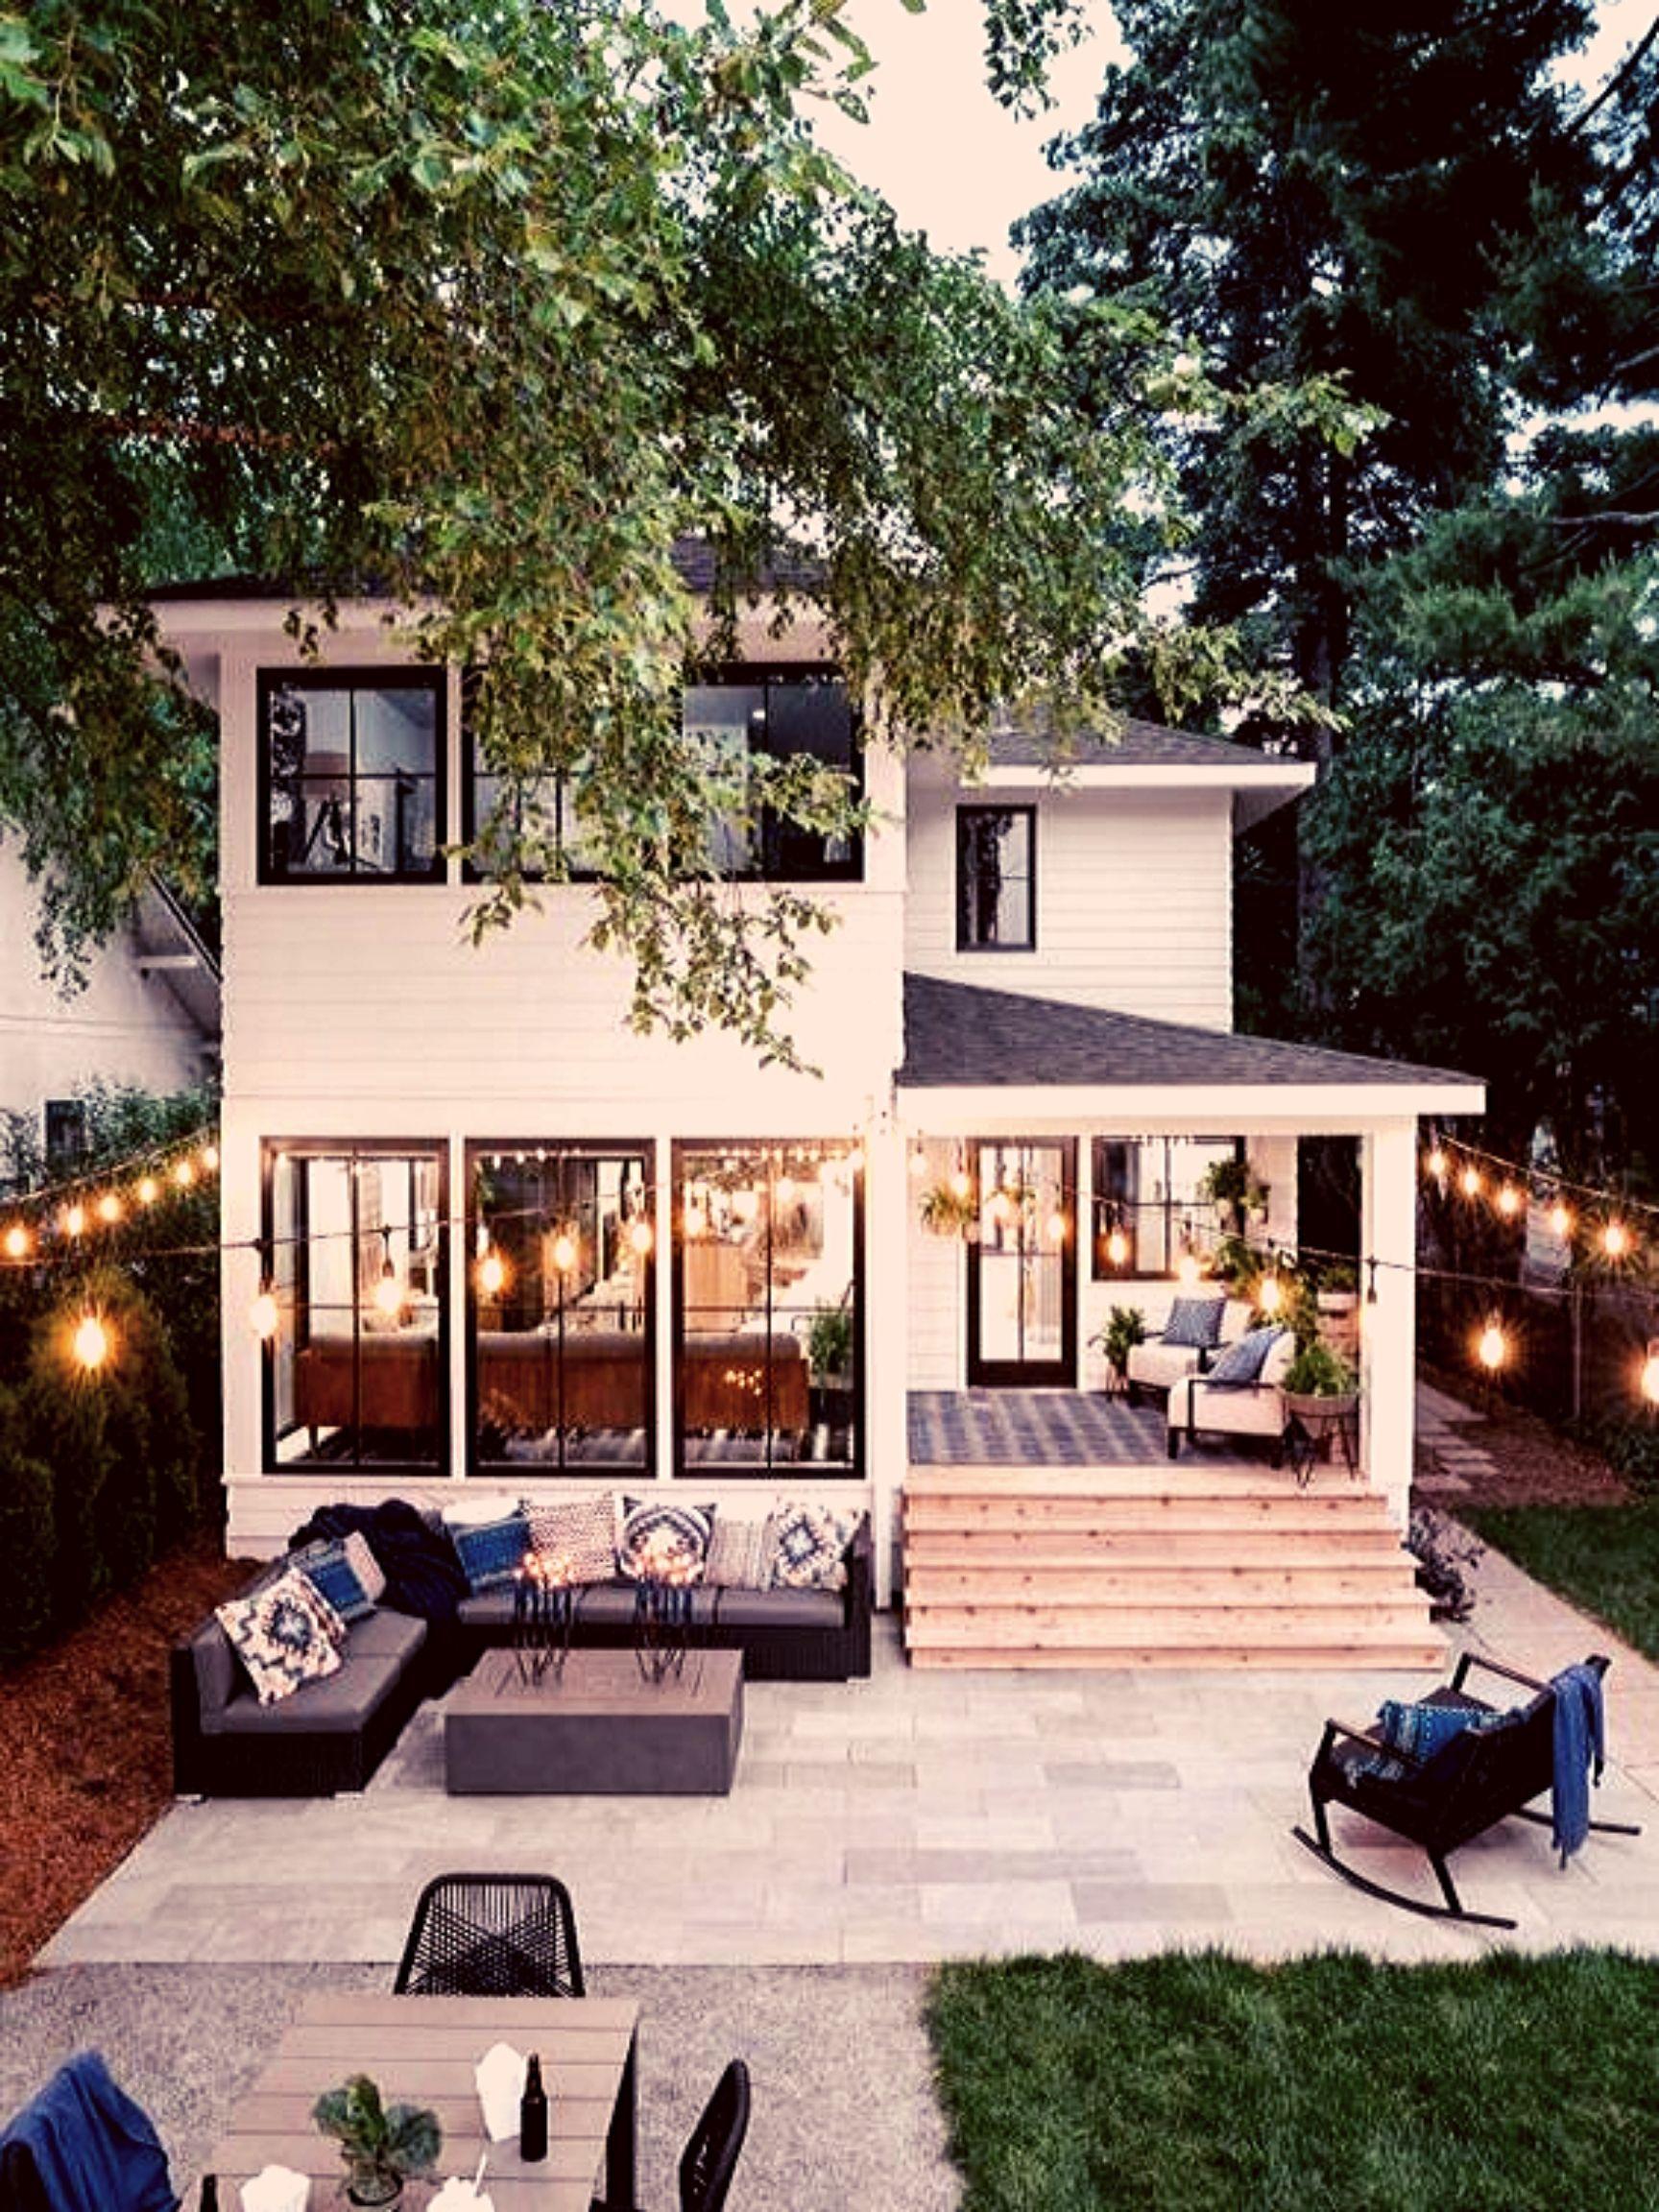 Pin By Michelle Westlund On Future Home Dream House Exterior House Exterior Future House Modern backyard makeover hgtv